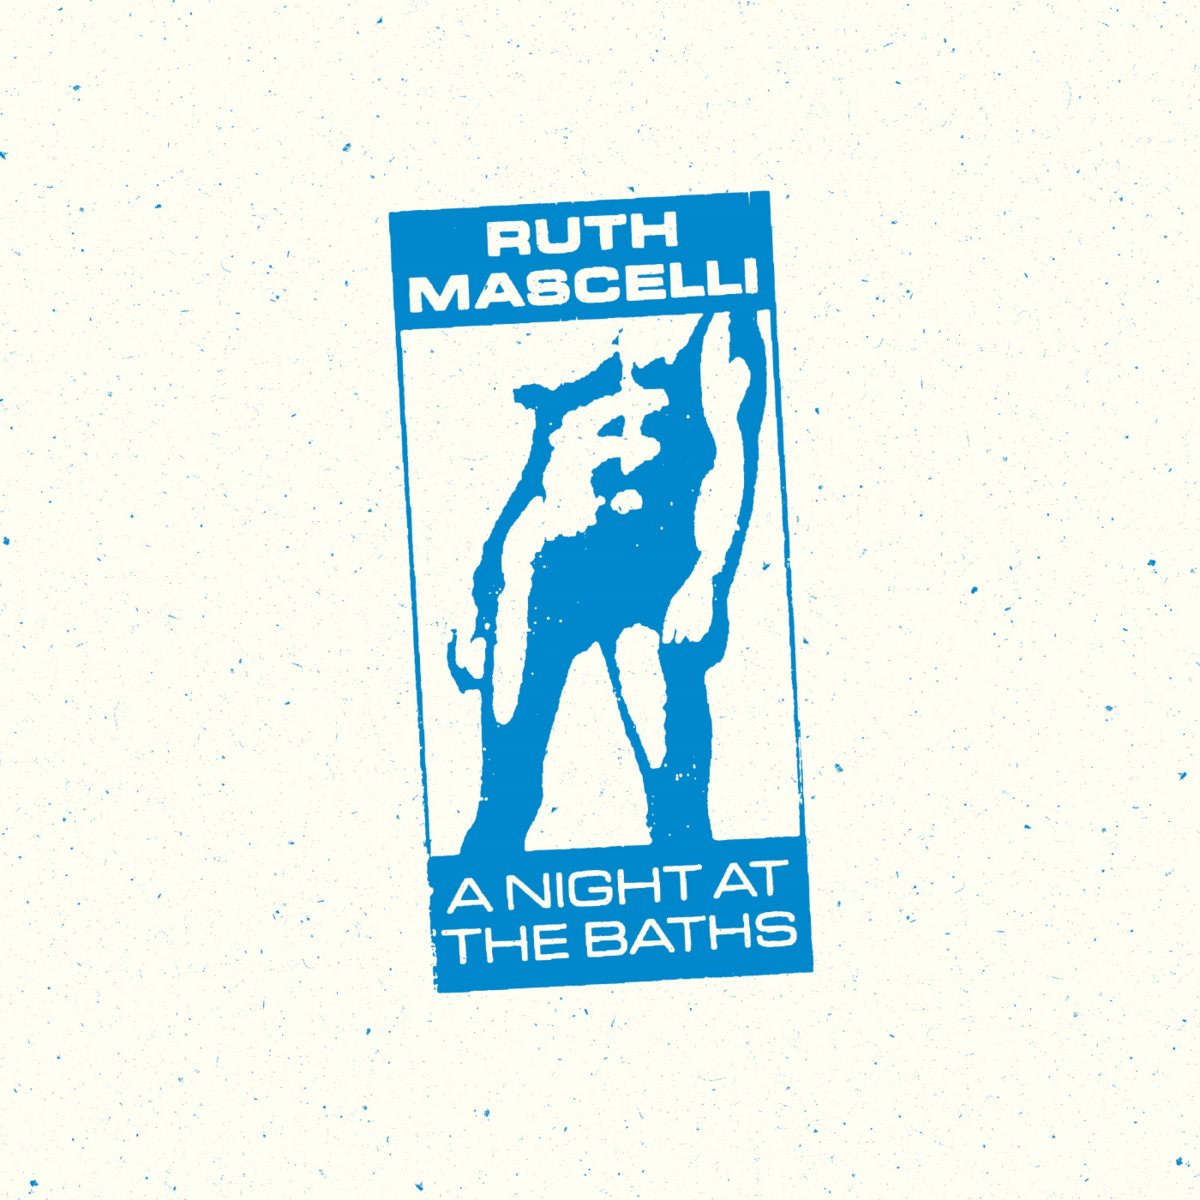 Ruth Mascelli Album Cover